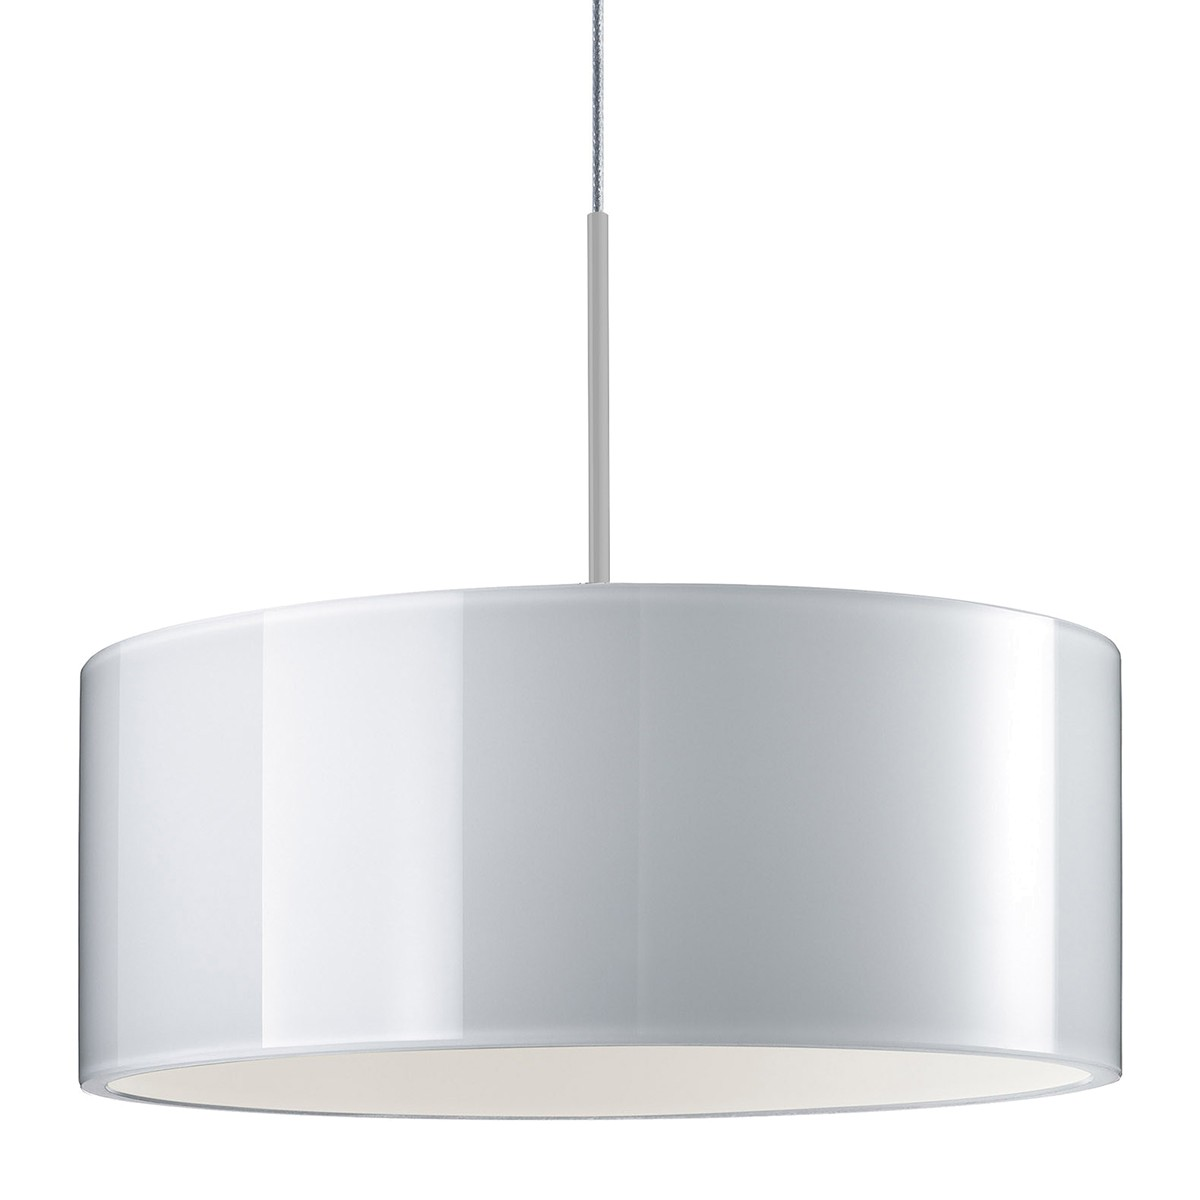 Bruck Duolare Cantara Glas Chrom matt Ø: 30 cm, LED Pendelleuchte, weiß